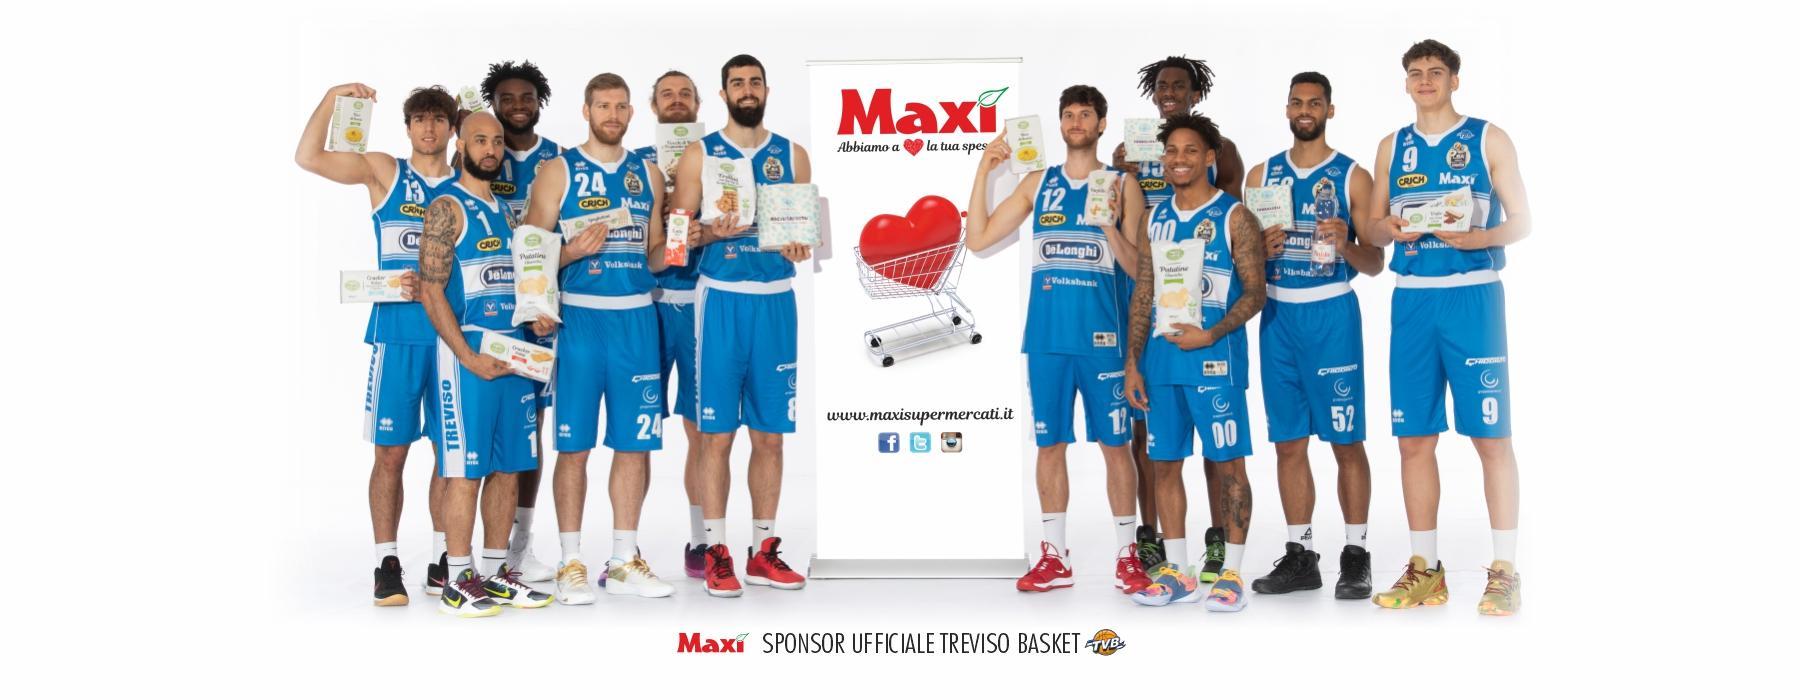 Maxì e Treviso Basket